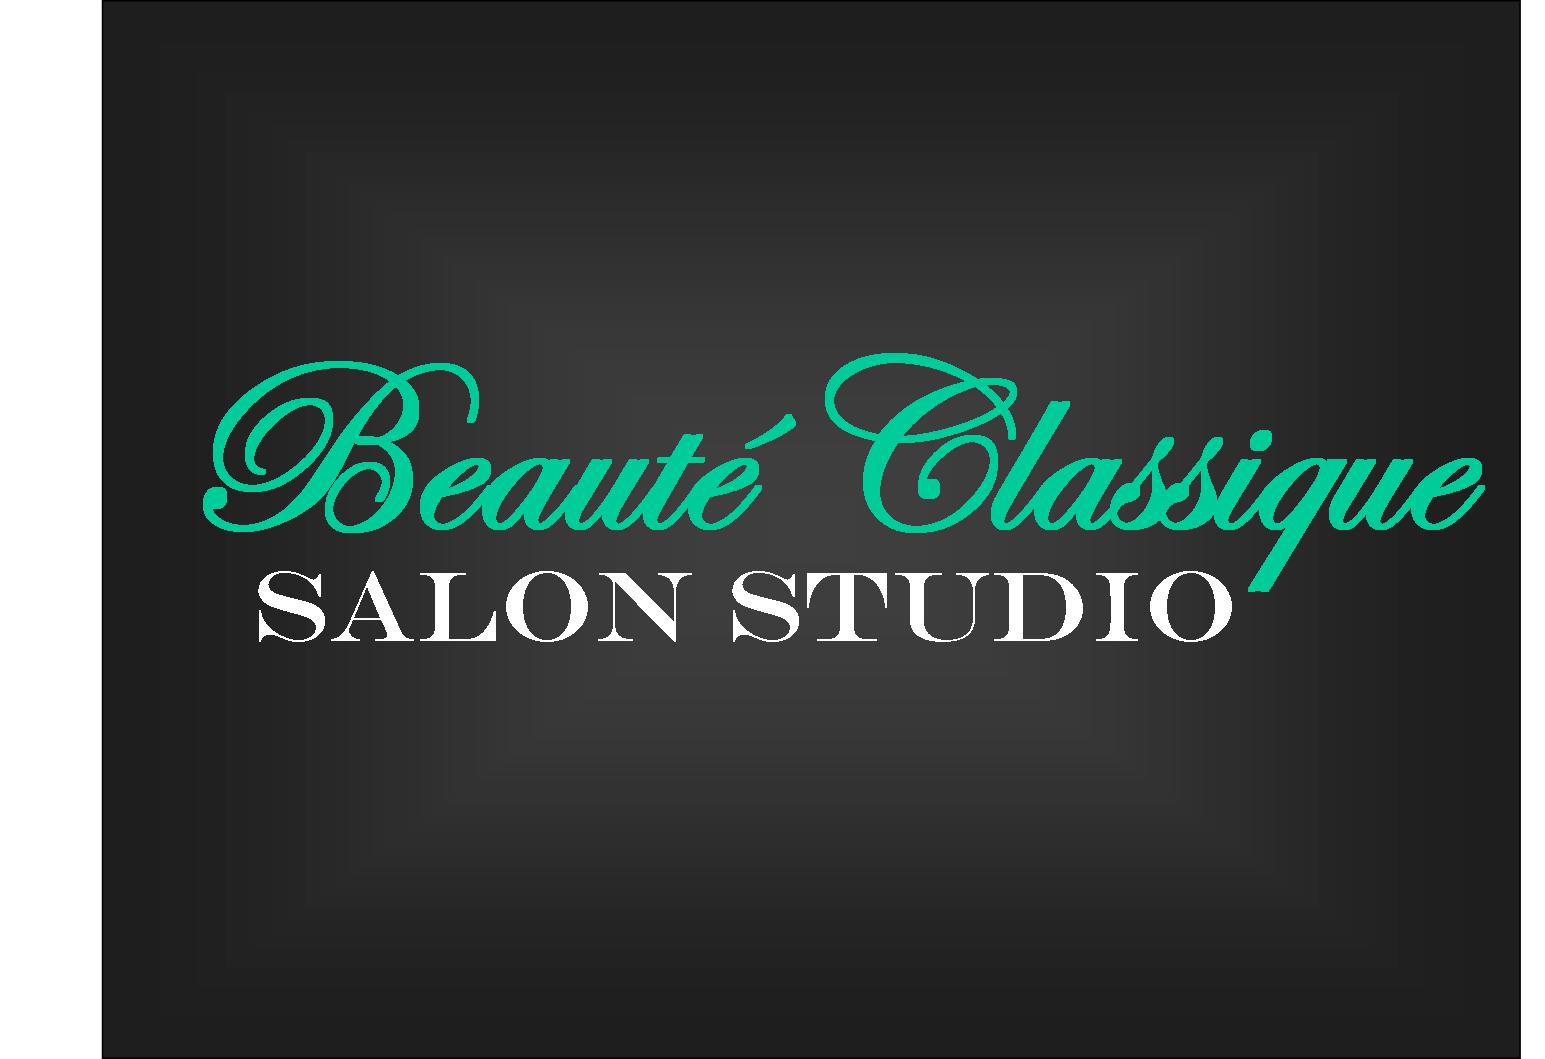 Beaute Classique Salon Studio